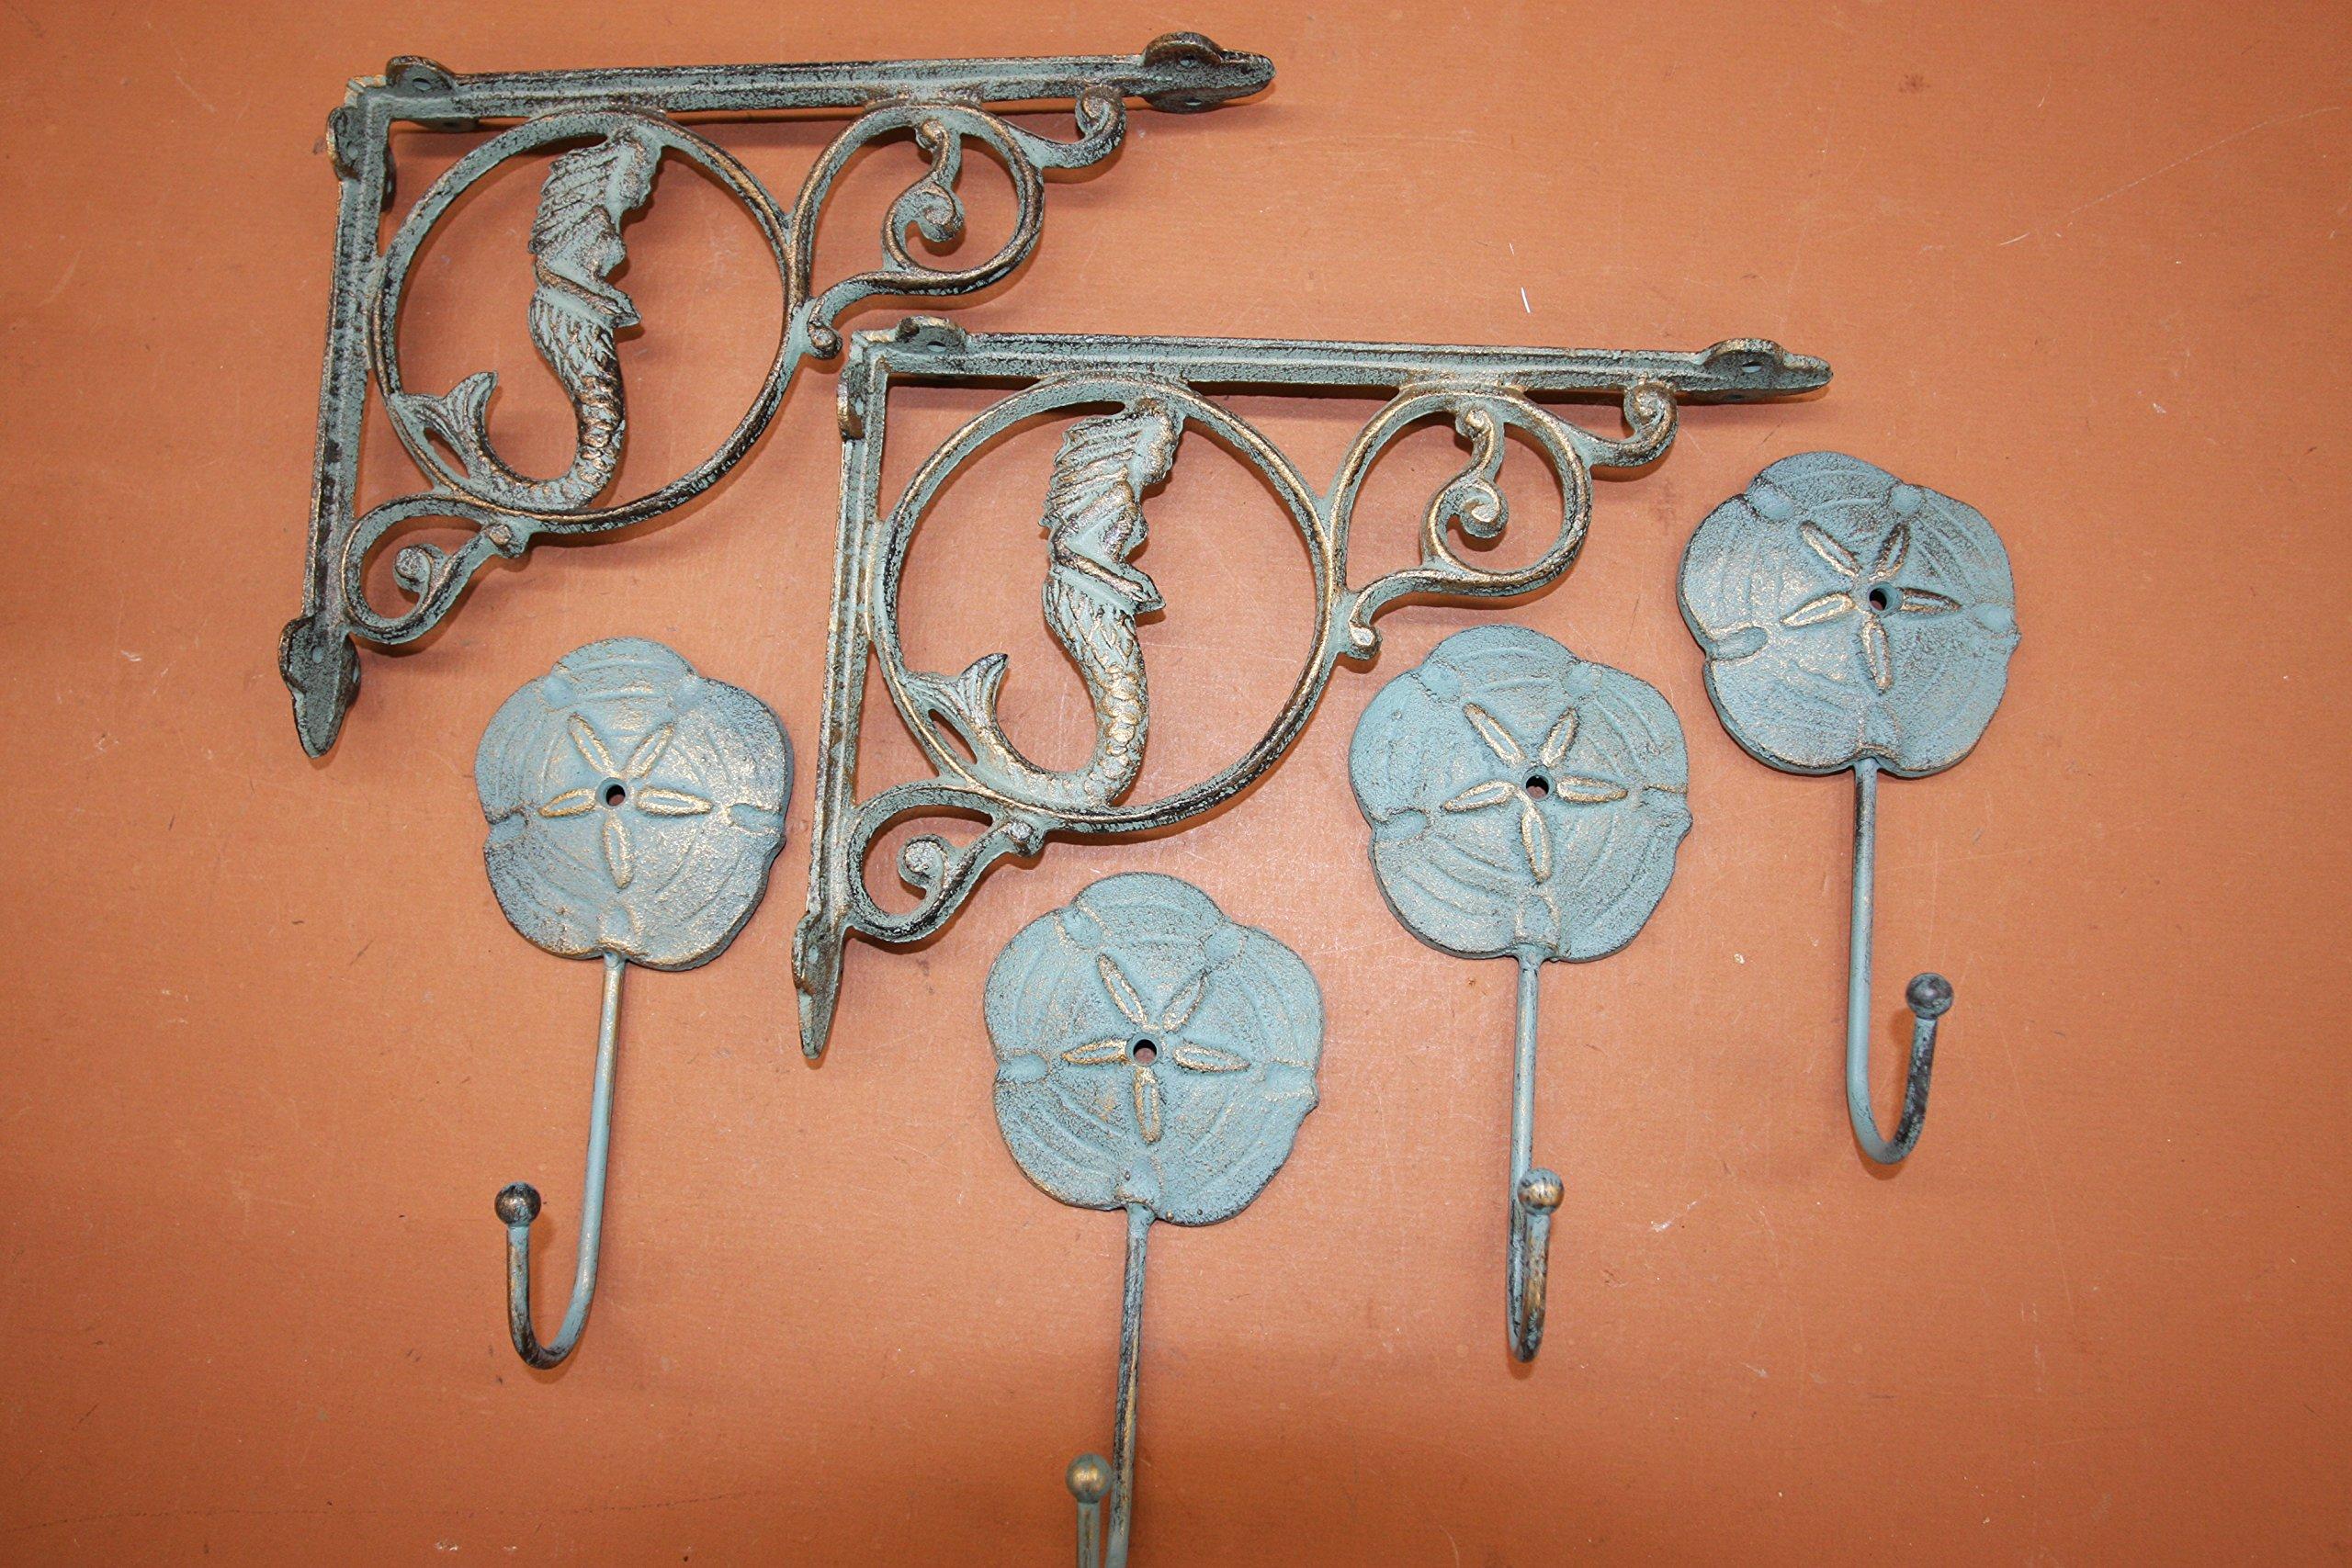 Antique-look Mermaid Corbels Sand Dollar Wall Hook Set, Cast Iron Bronze-look Bundle 6 Items